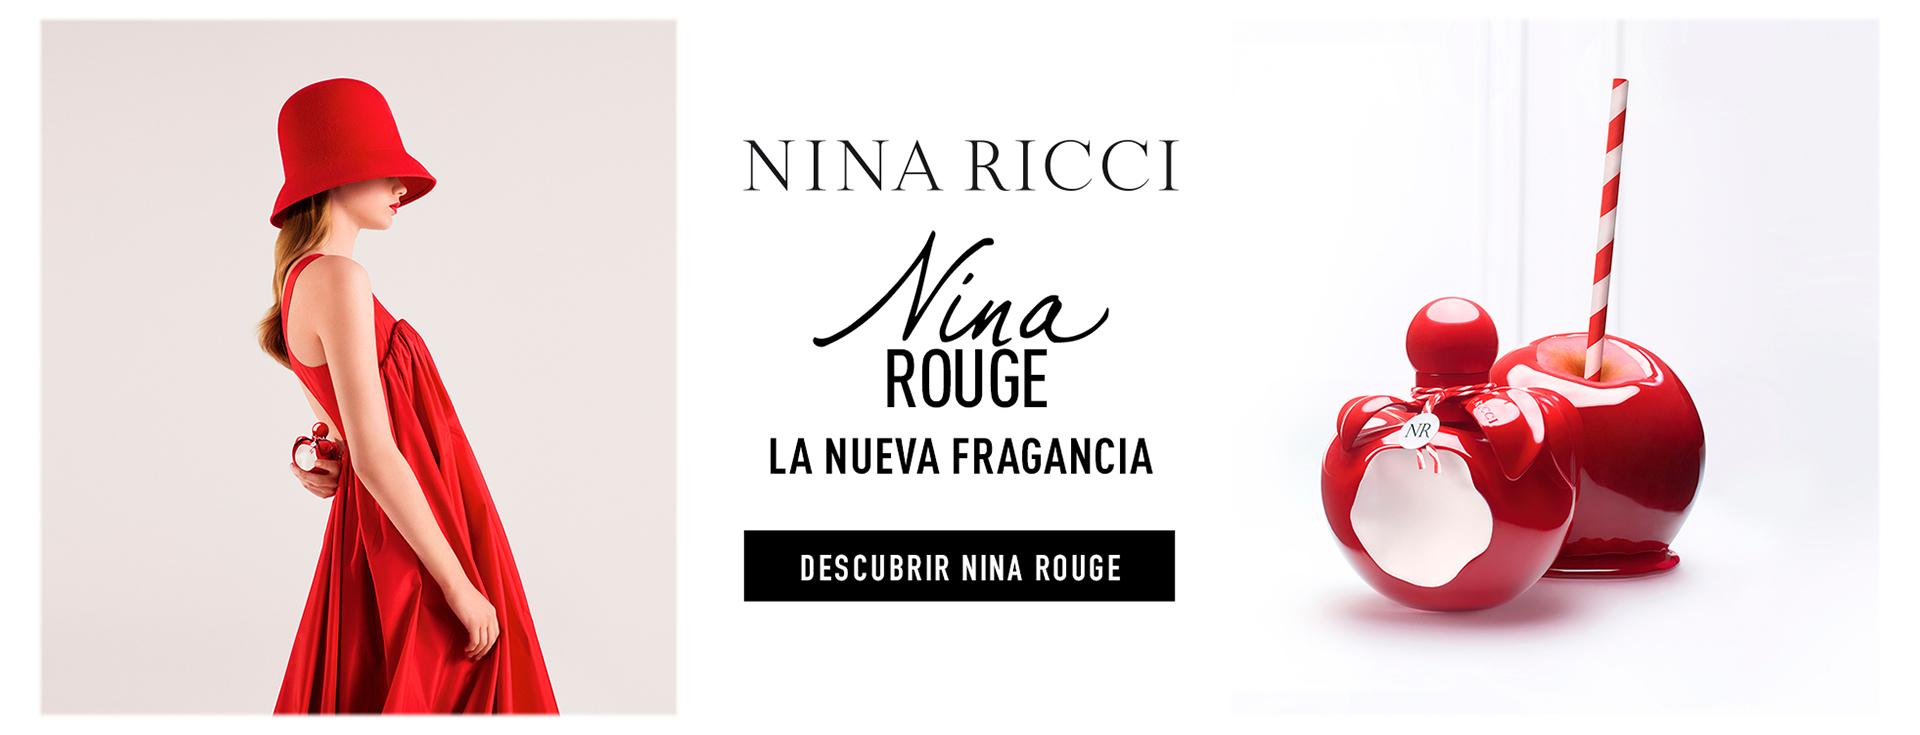 Perfumes Nina Ricci Comprar Online | Marvimundo